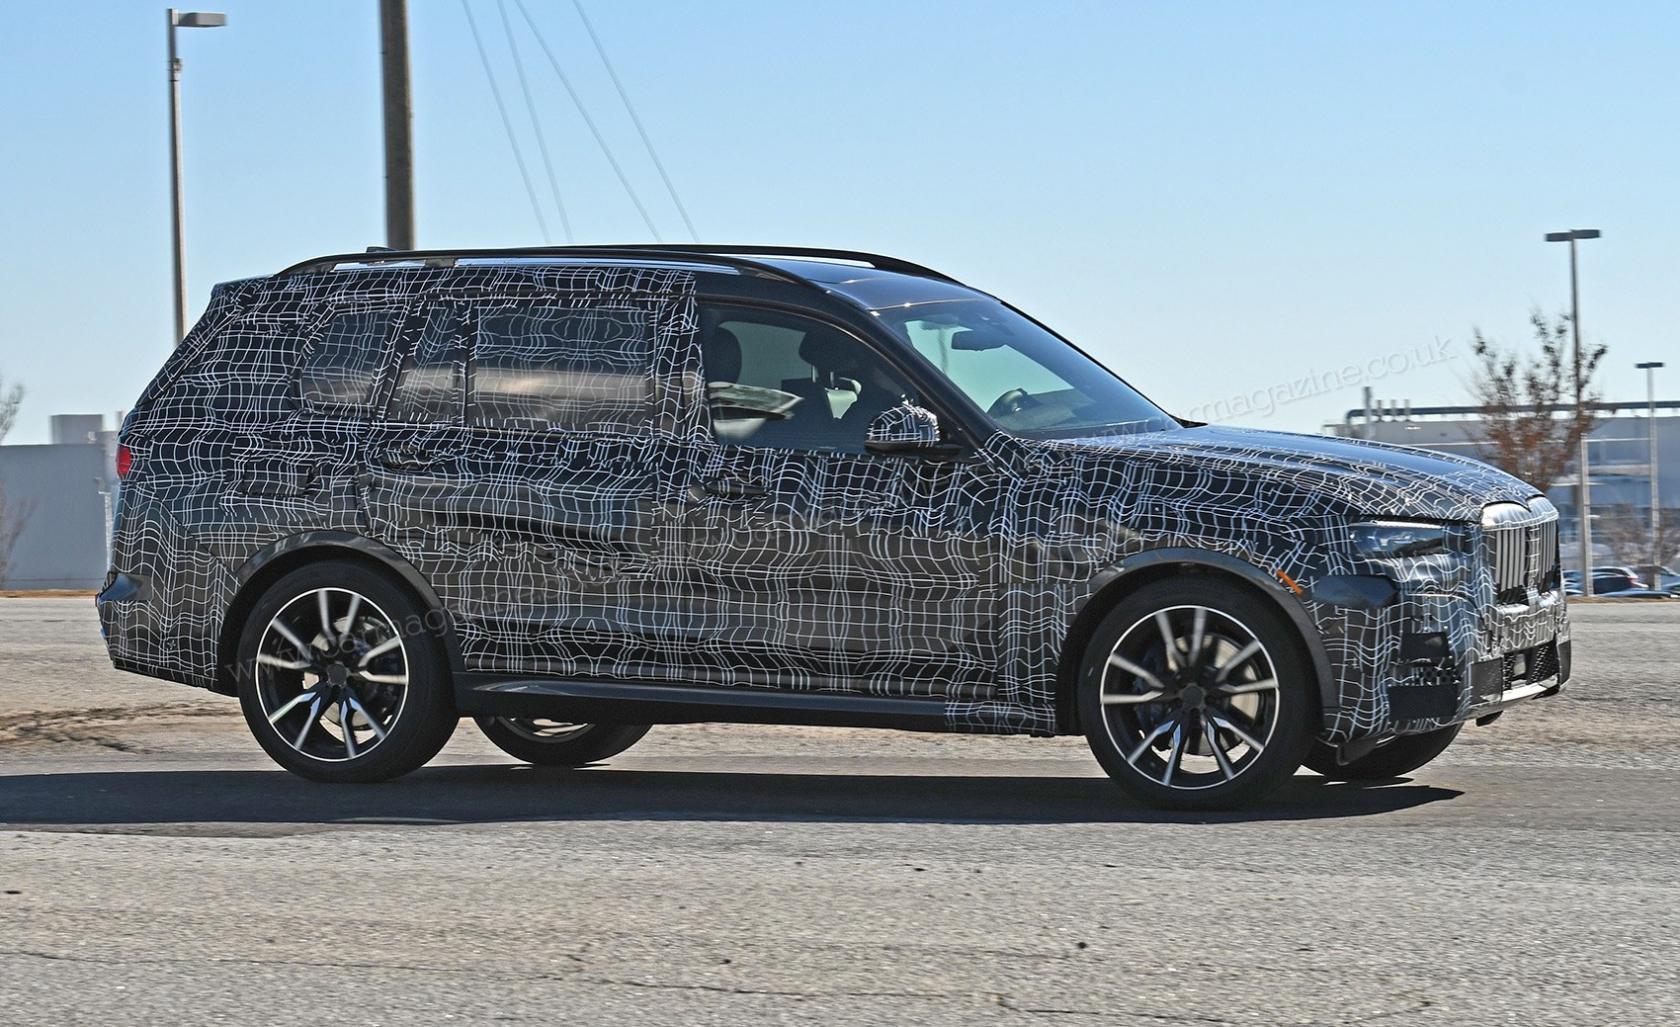 BMW-X7-7.jpeg